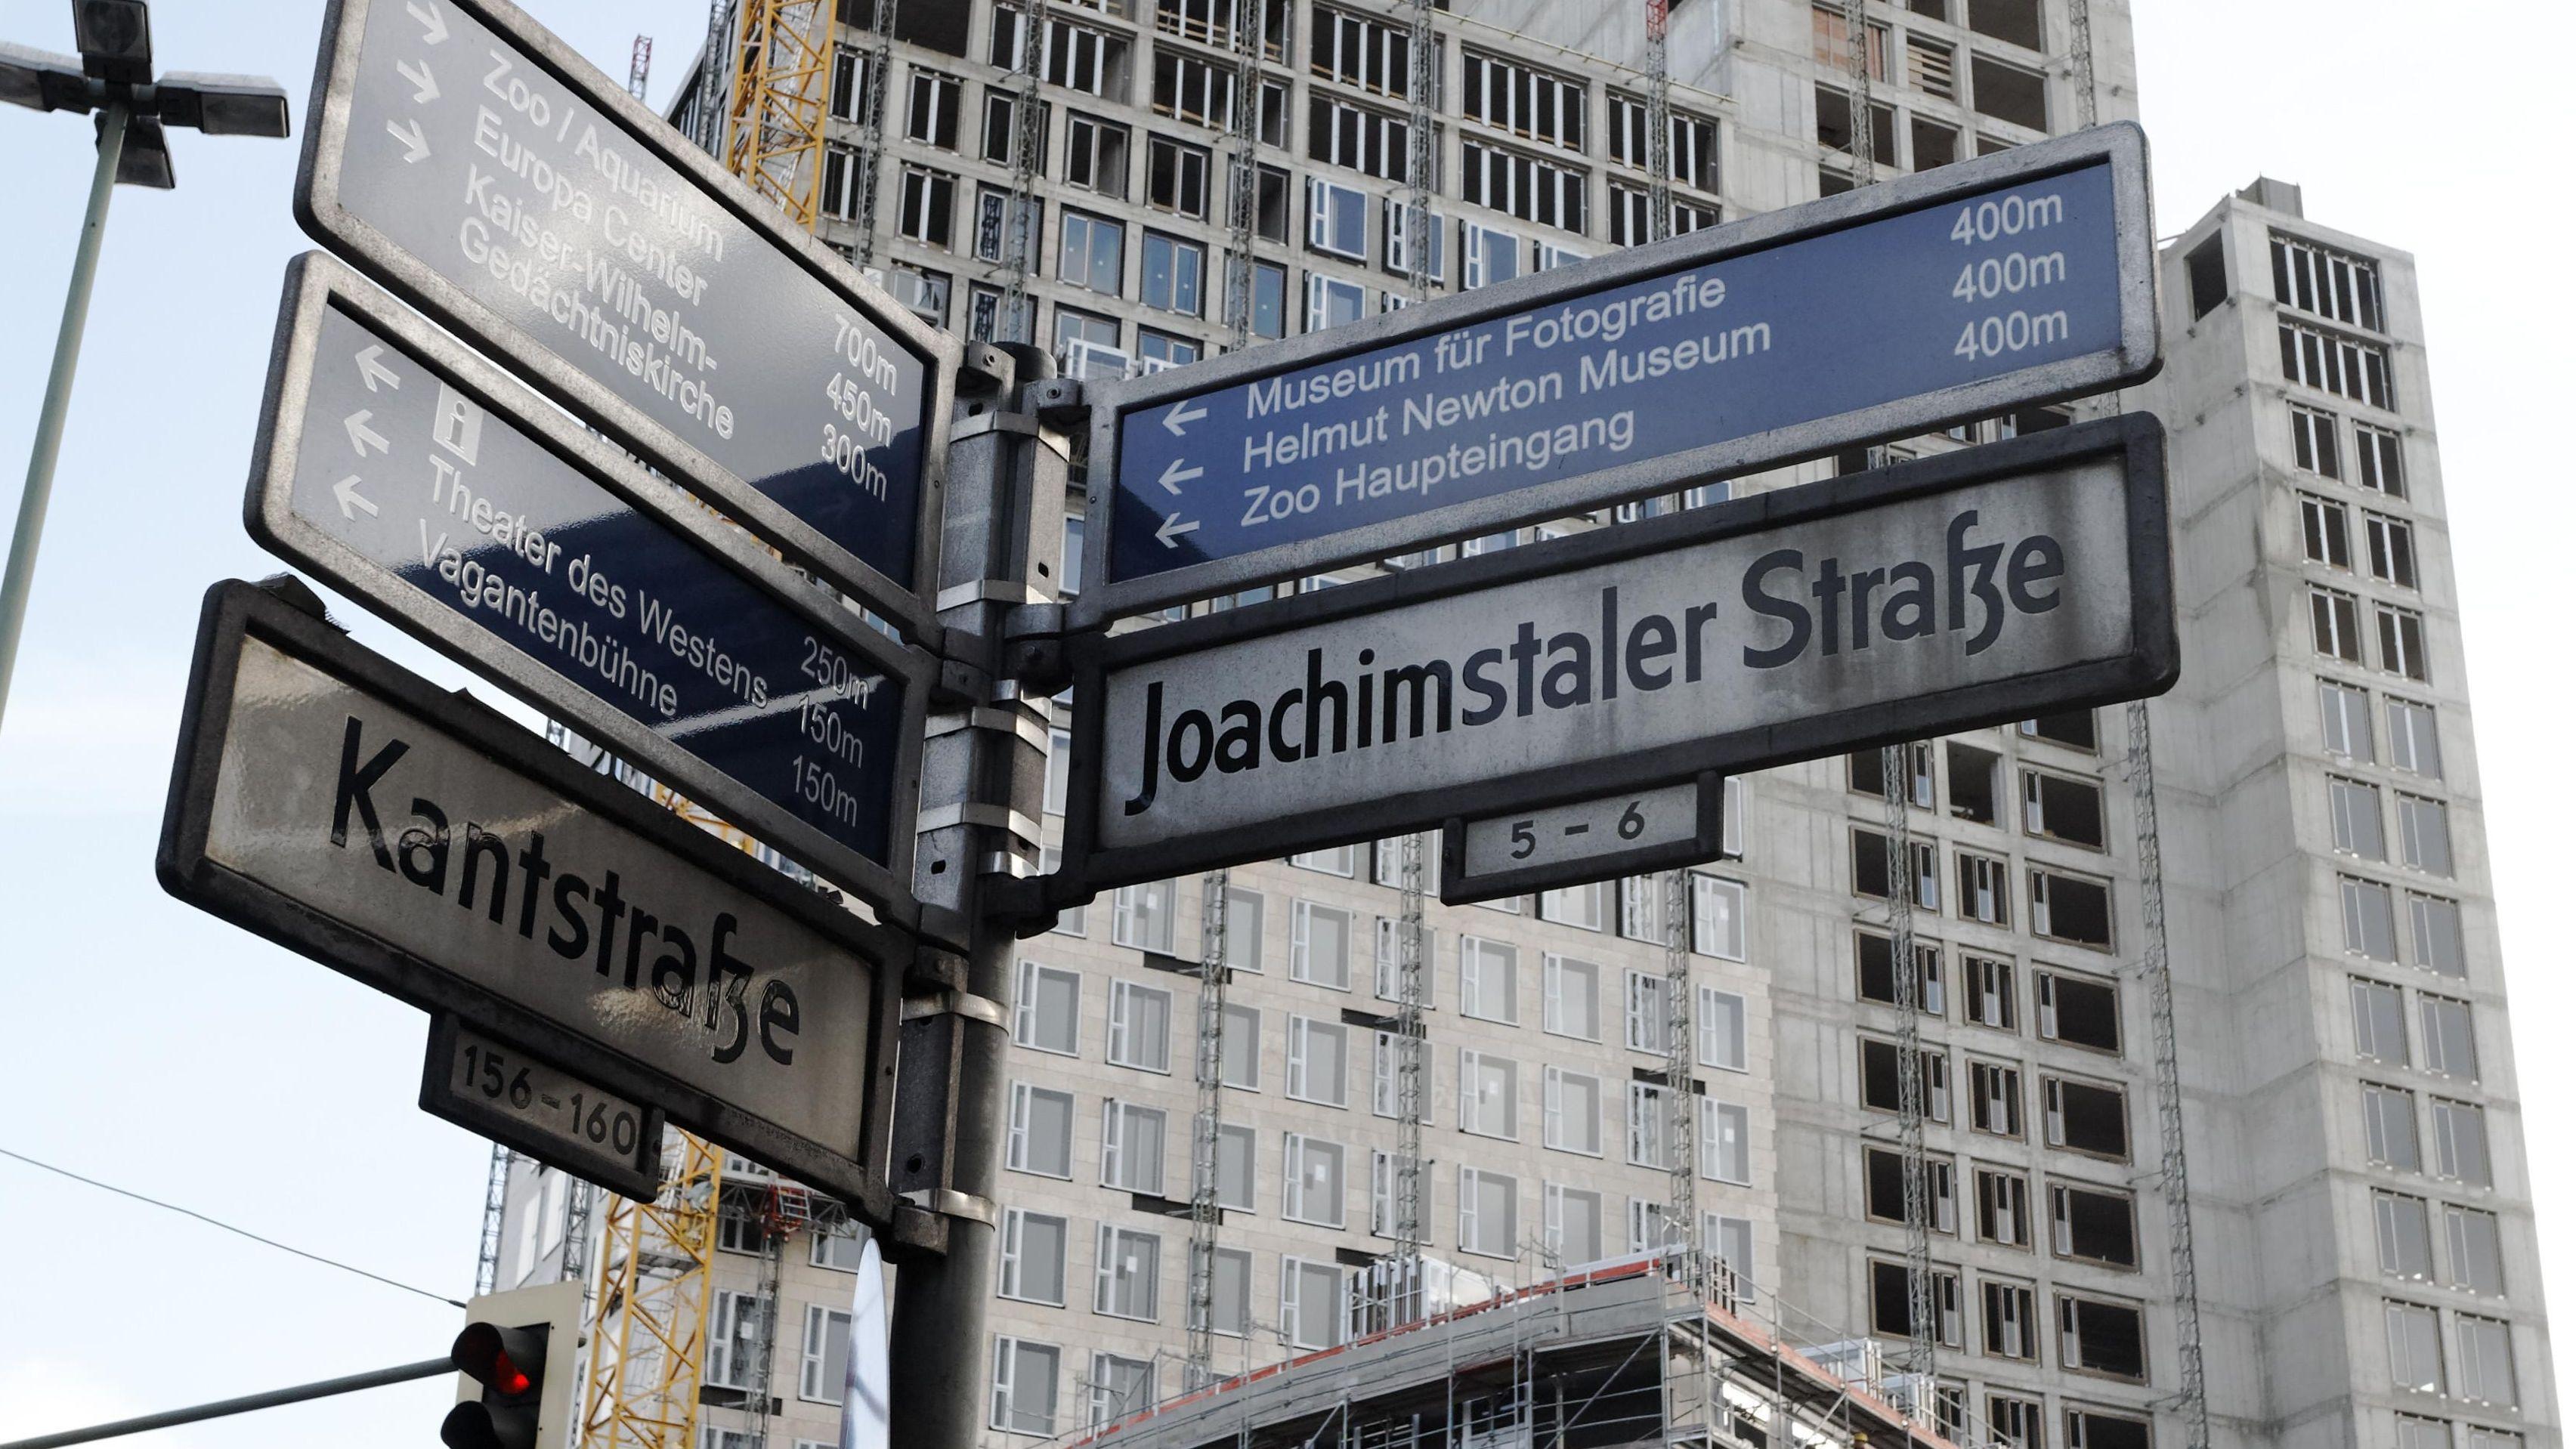 Kantstraße/ Joachimstaler Straße: Straßenschild in Berlin vor einem Neubau